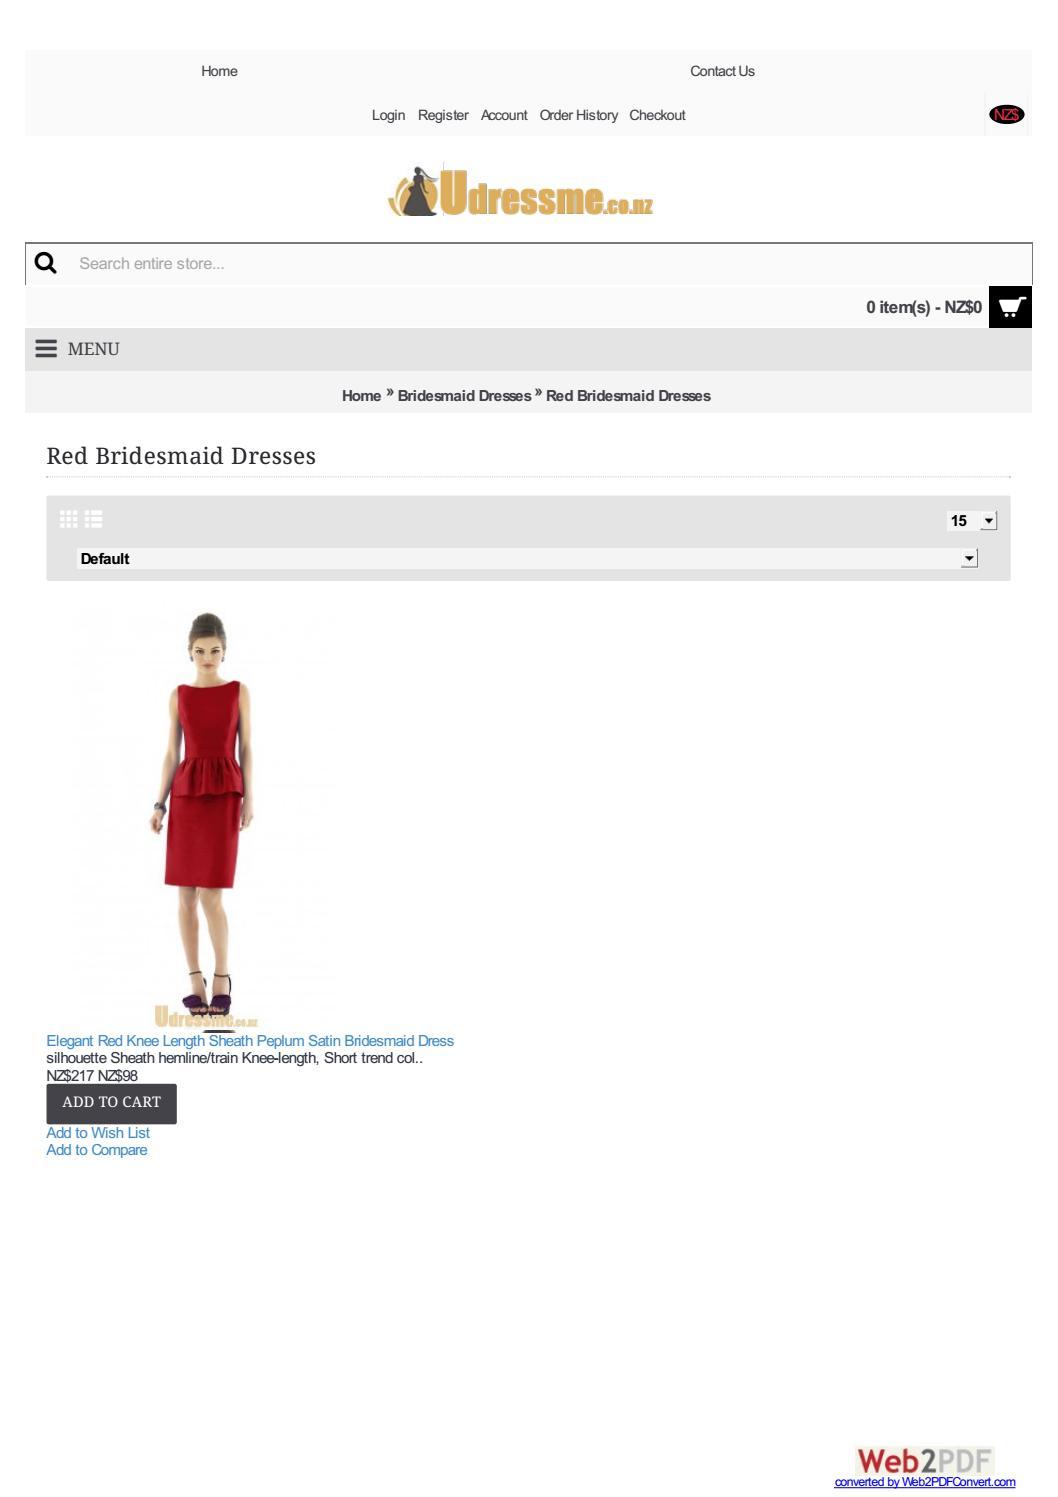 Red bridesmaid dresses nz by Alexadavis - issuu